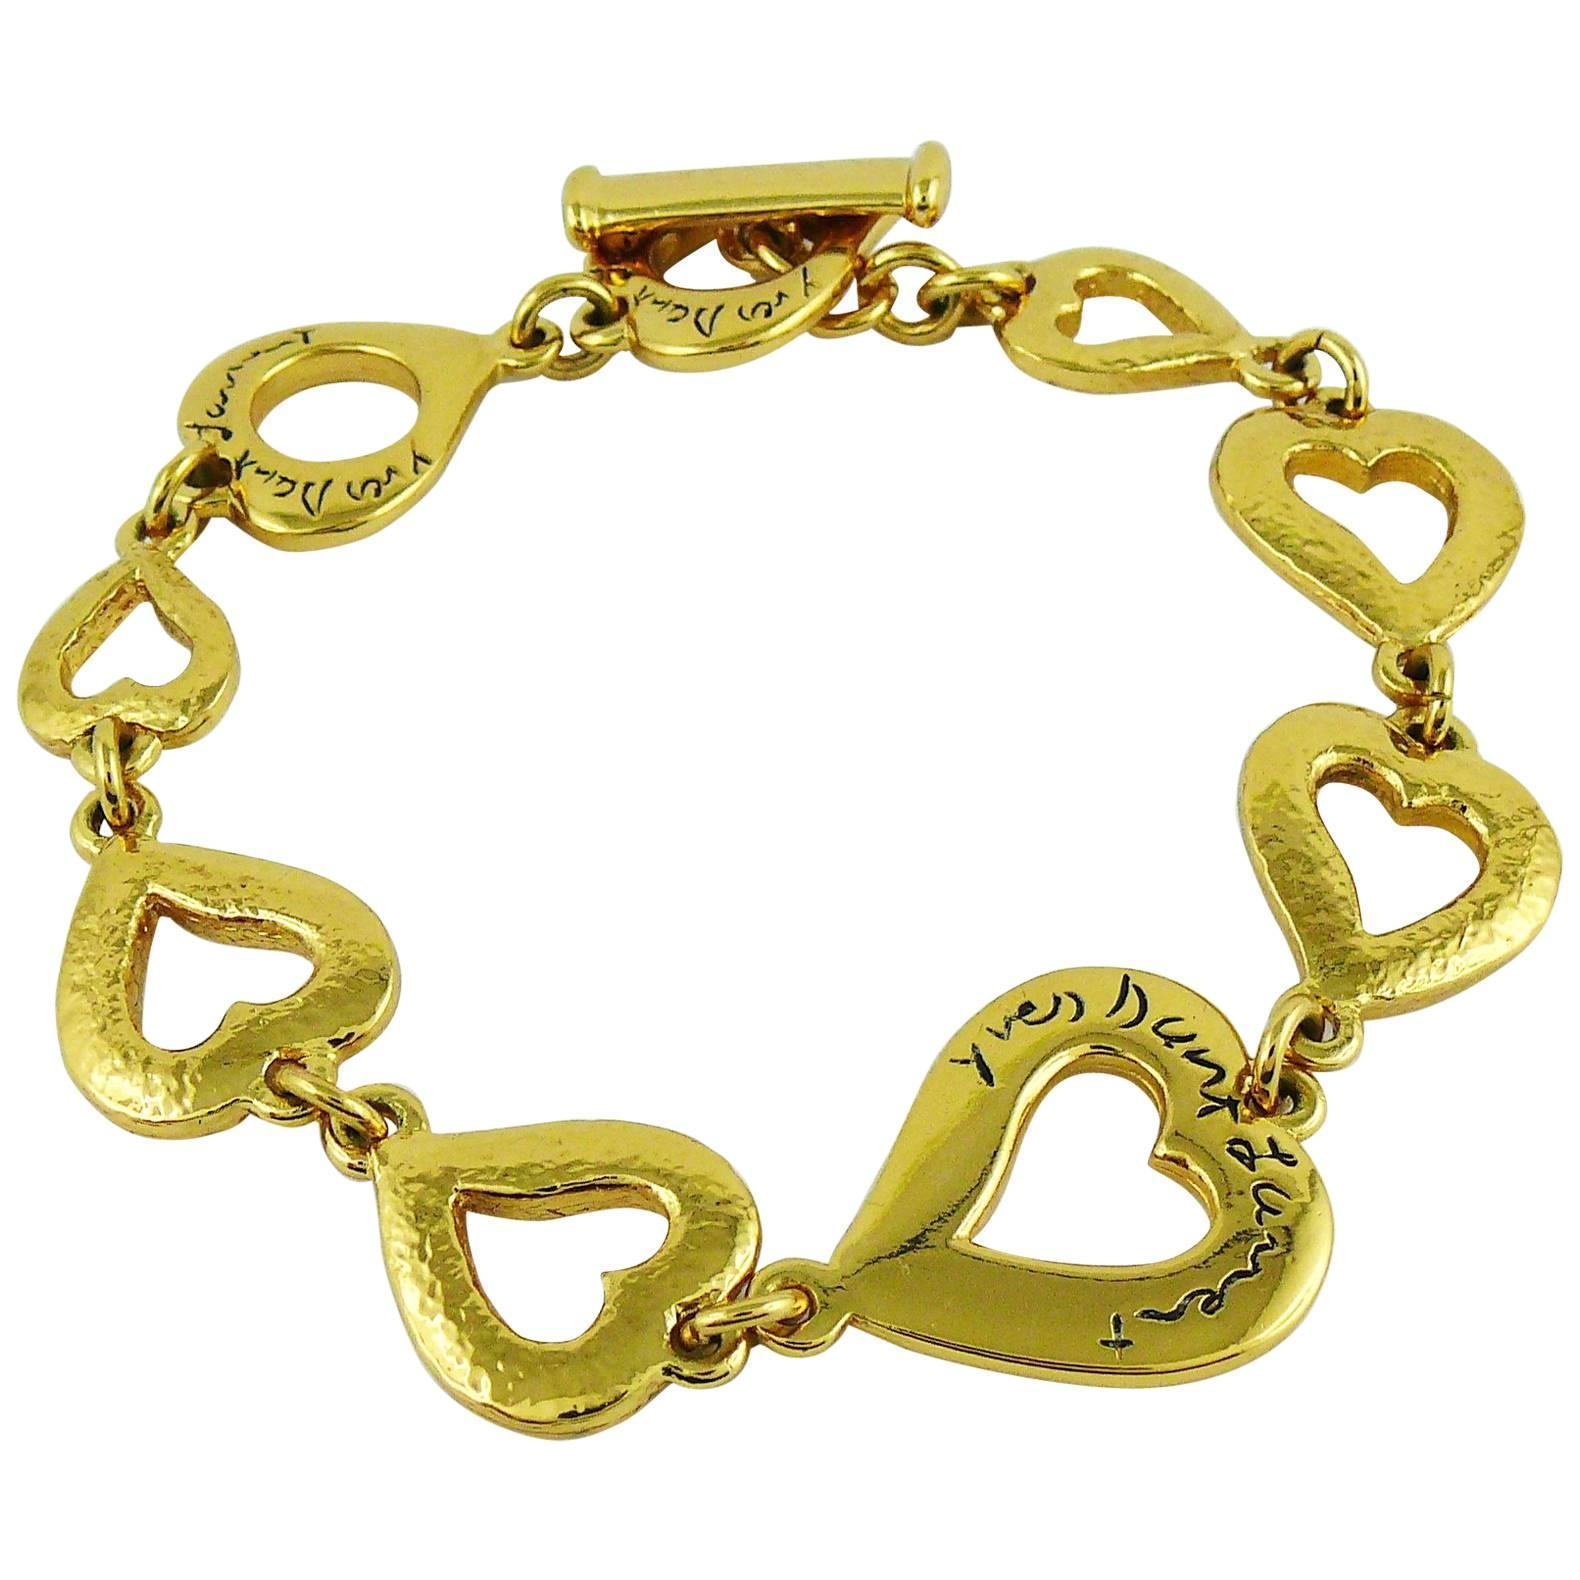 1030f0649aa Yves Saint Laurent YSL Vintage Gold Toned Heart Bracelet at 1stdibs